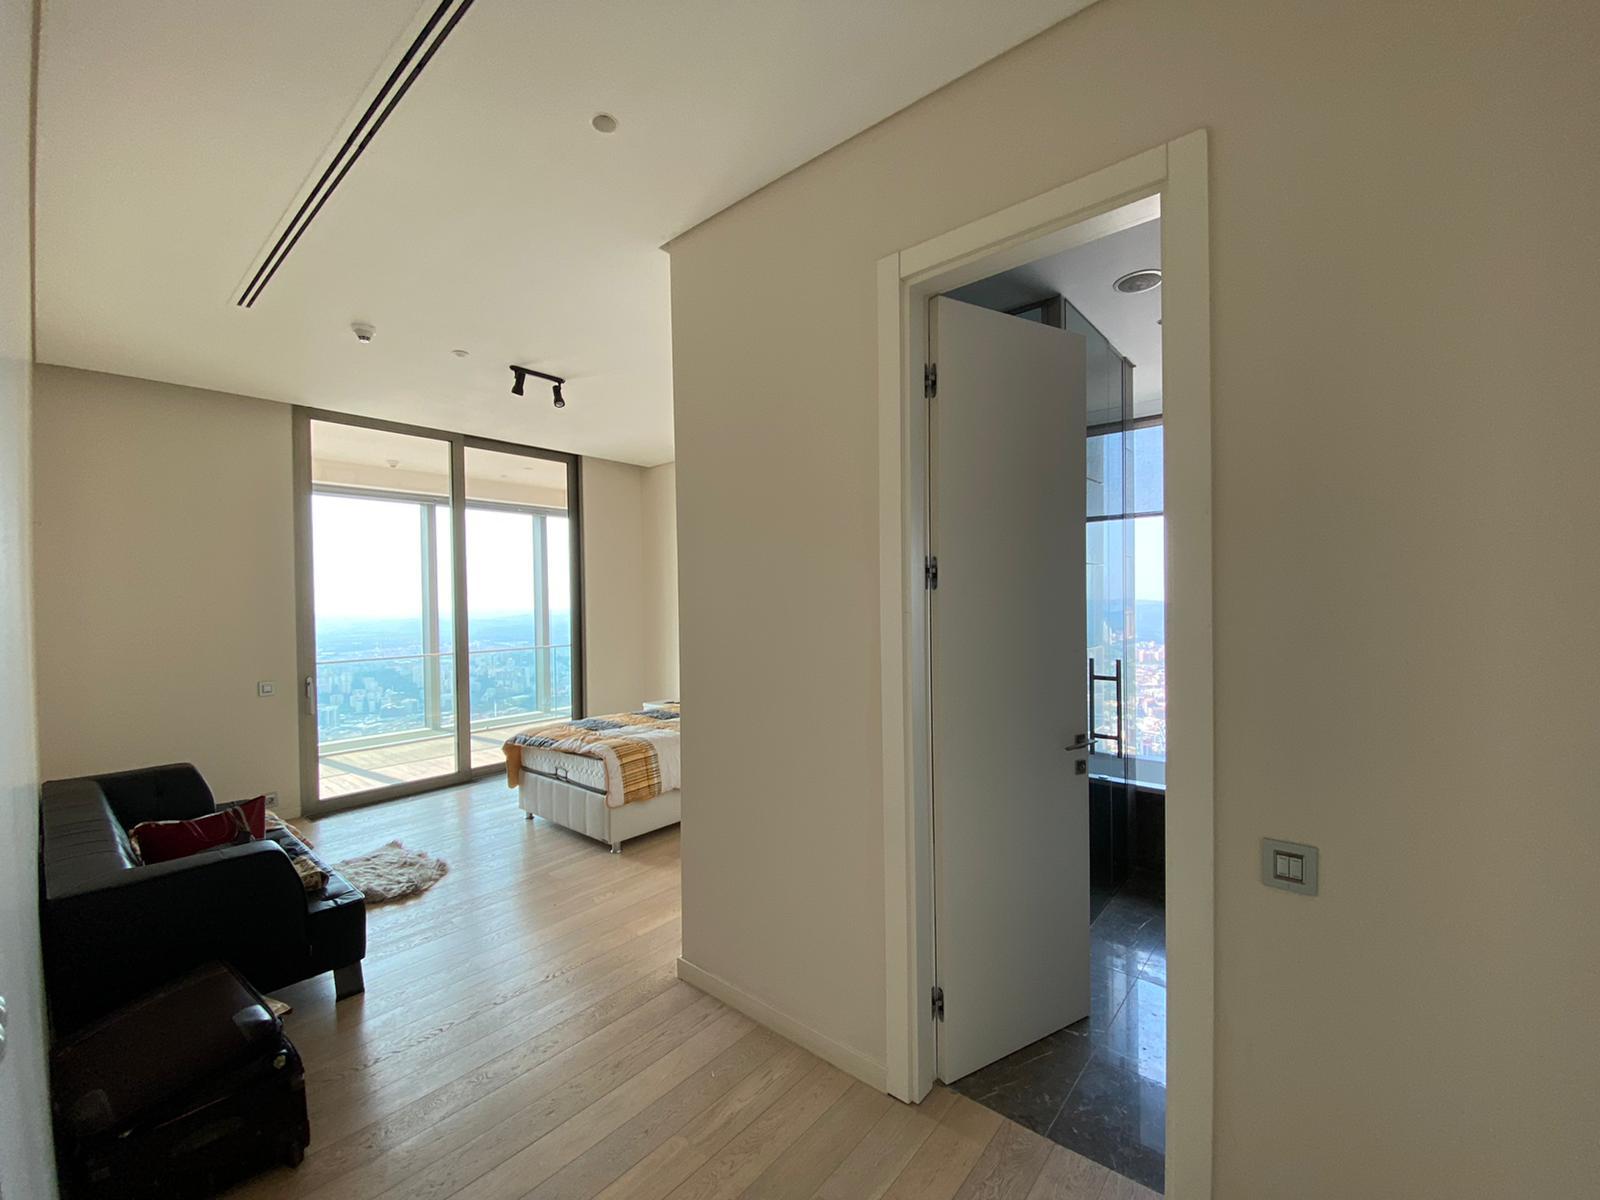 penthouse-istanbul-sapphire-tower-42th-floor-022.jpg